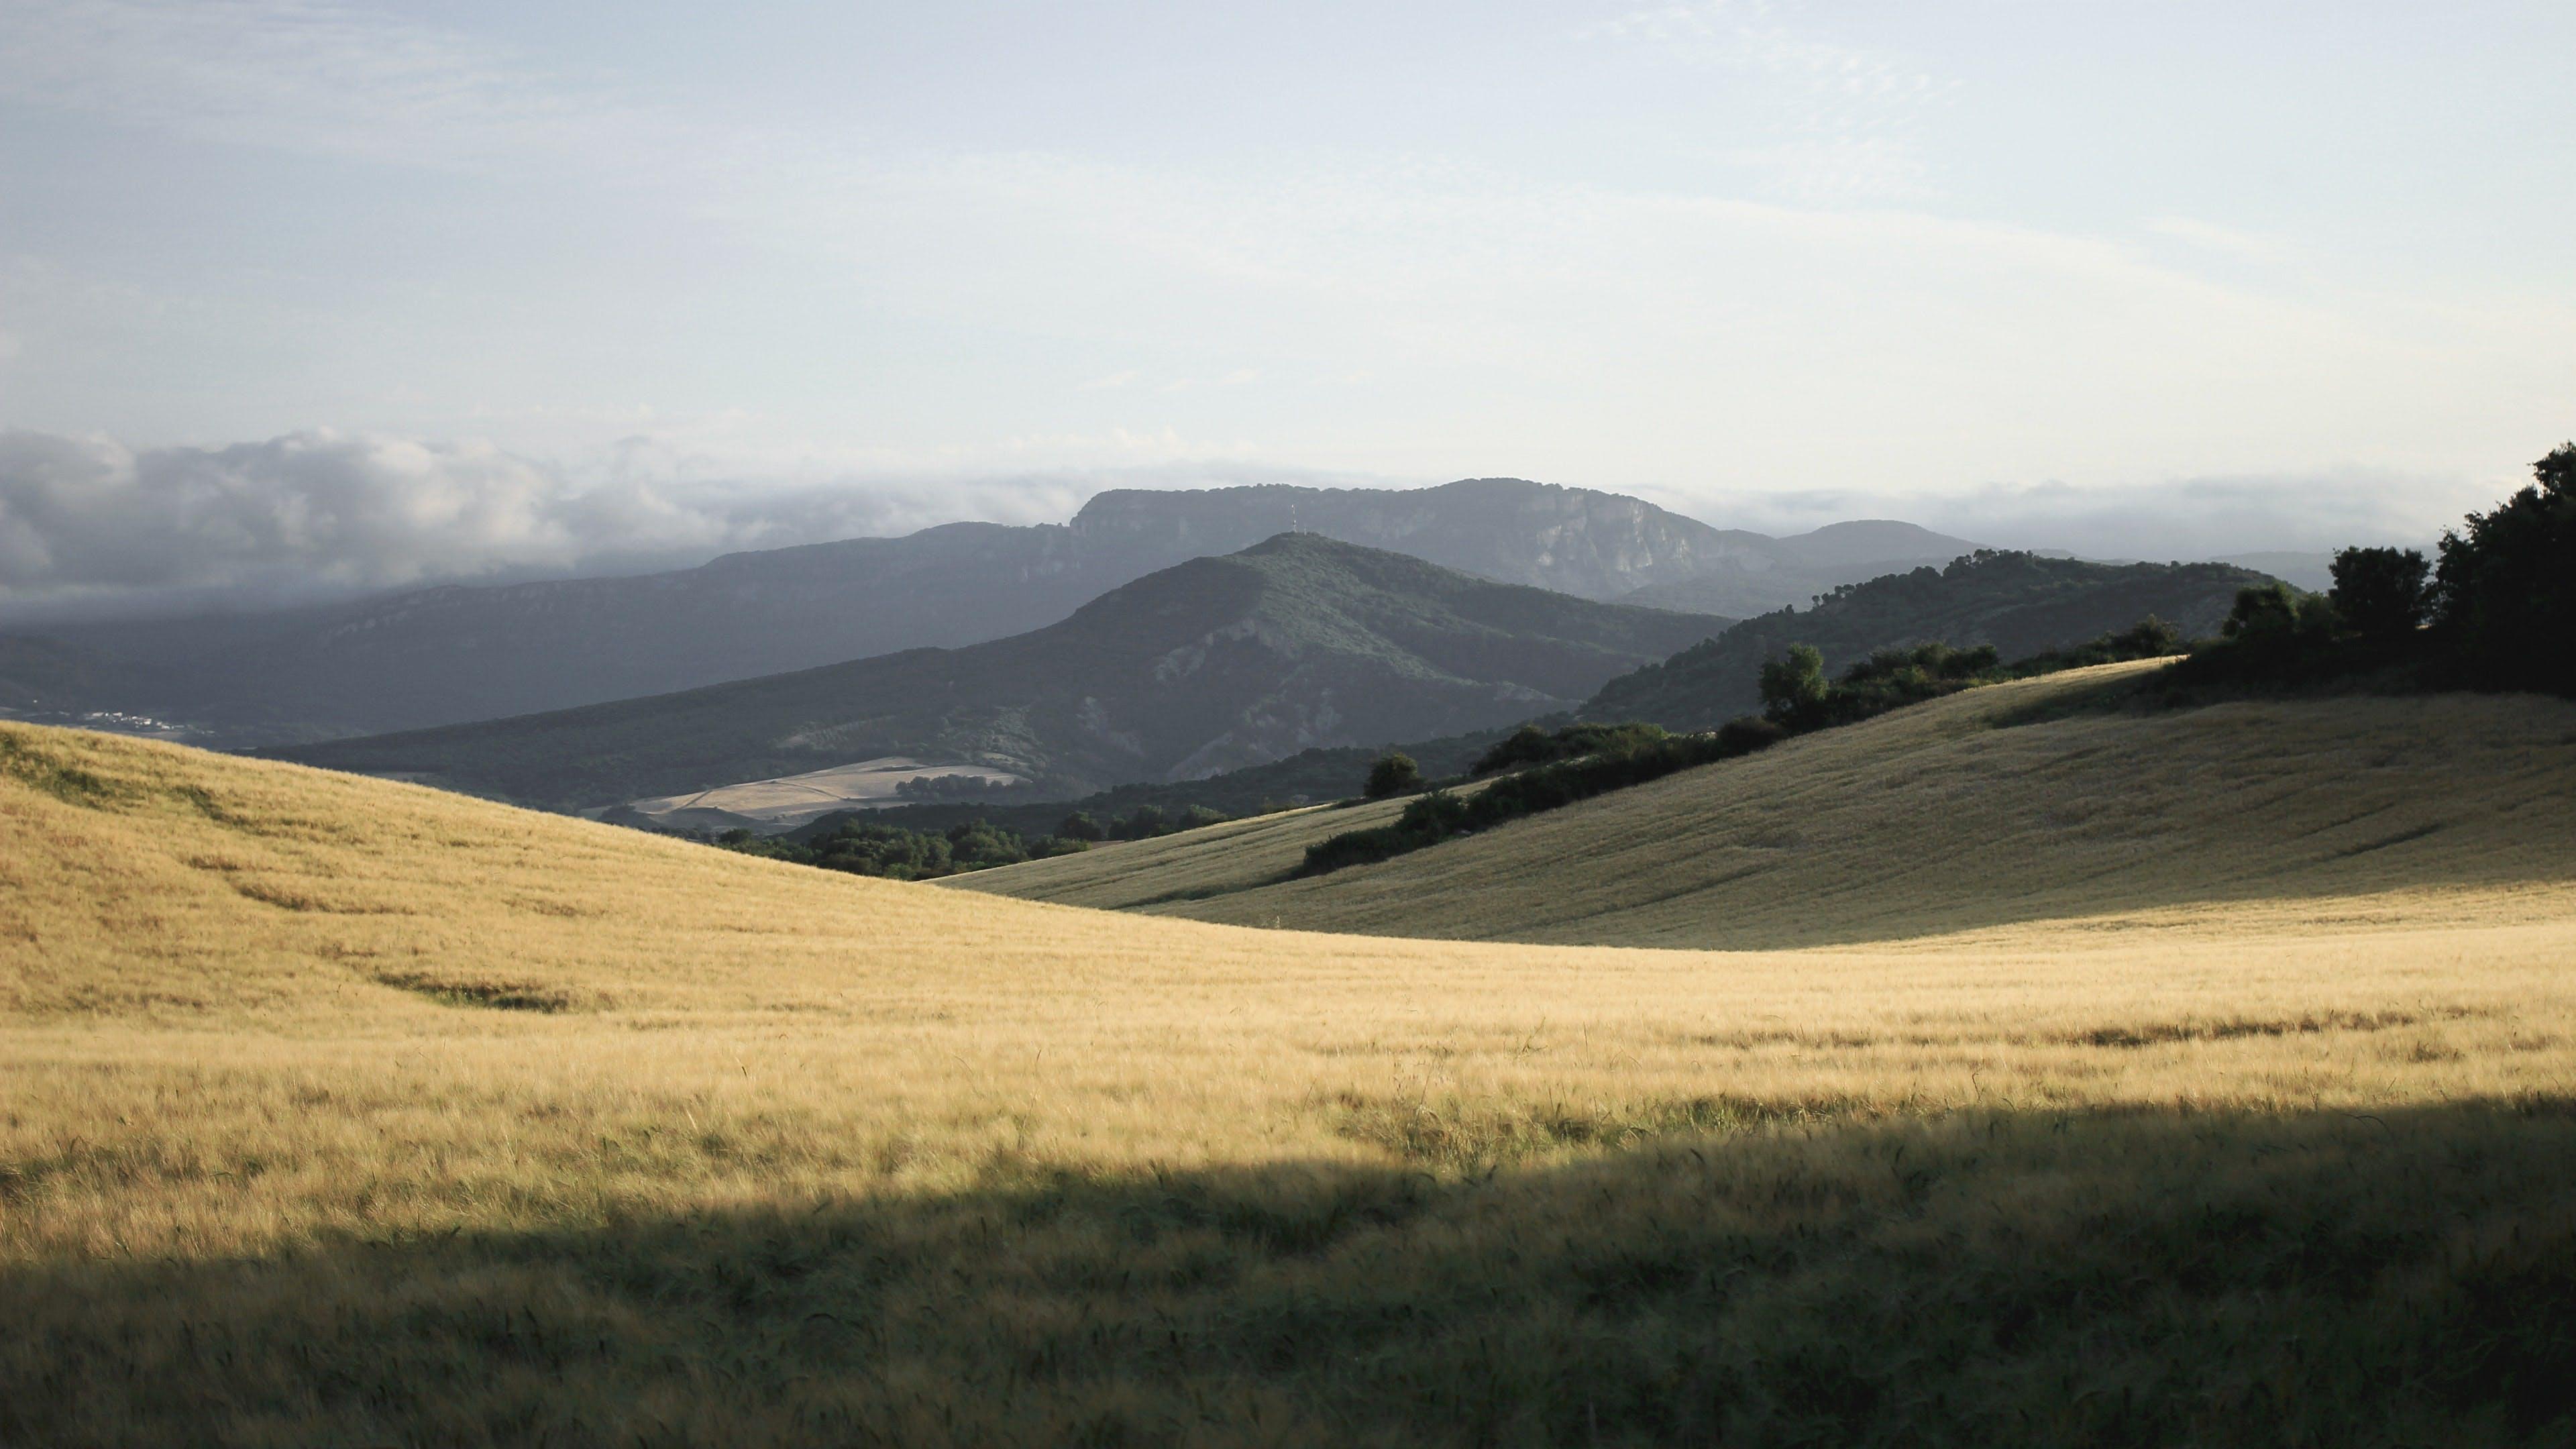 Camino de santiago - the best routes